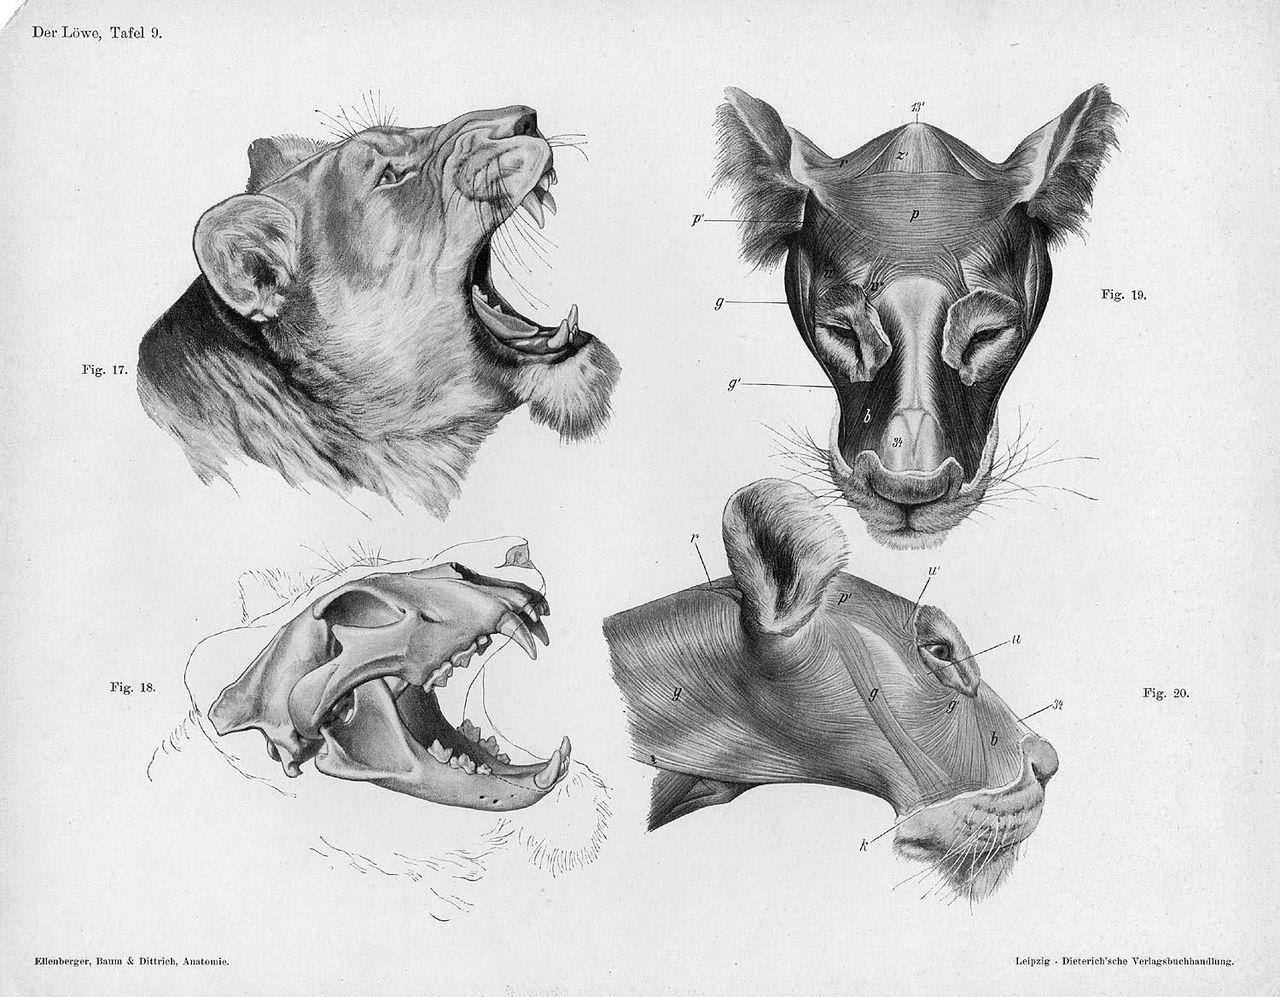 Lion Anatomy Skull Study : LotkaVolterra